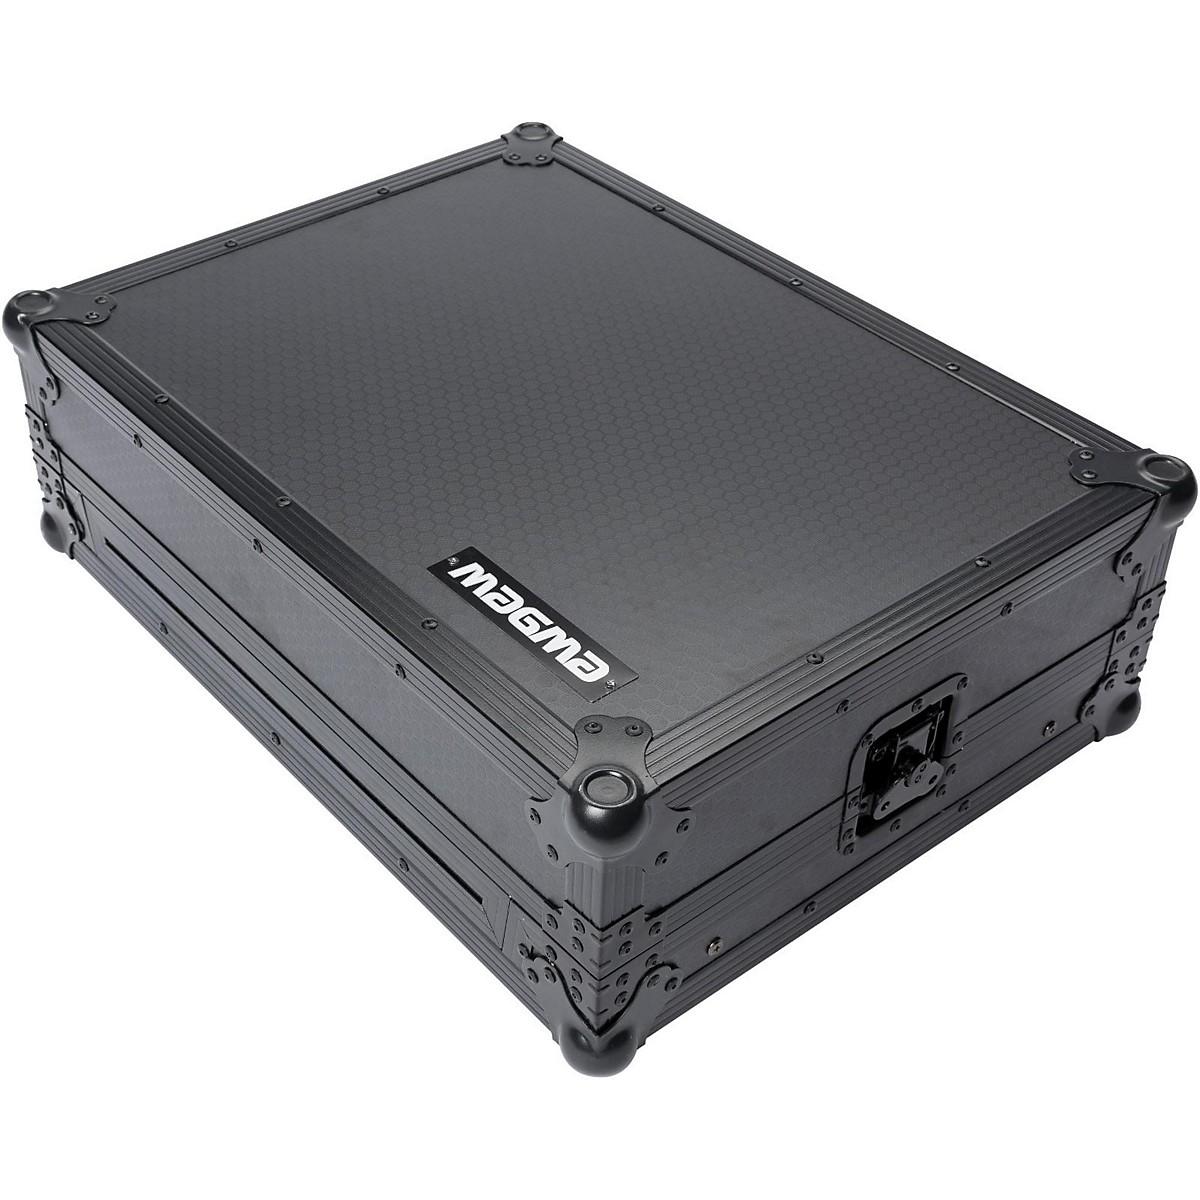 Magma Cases Multi-Format Workstation XL Plus